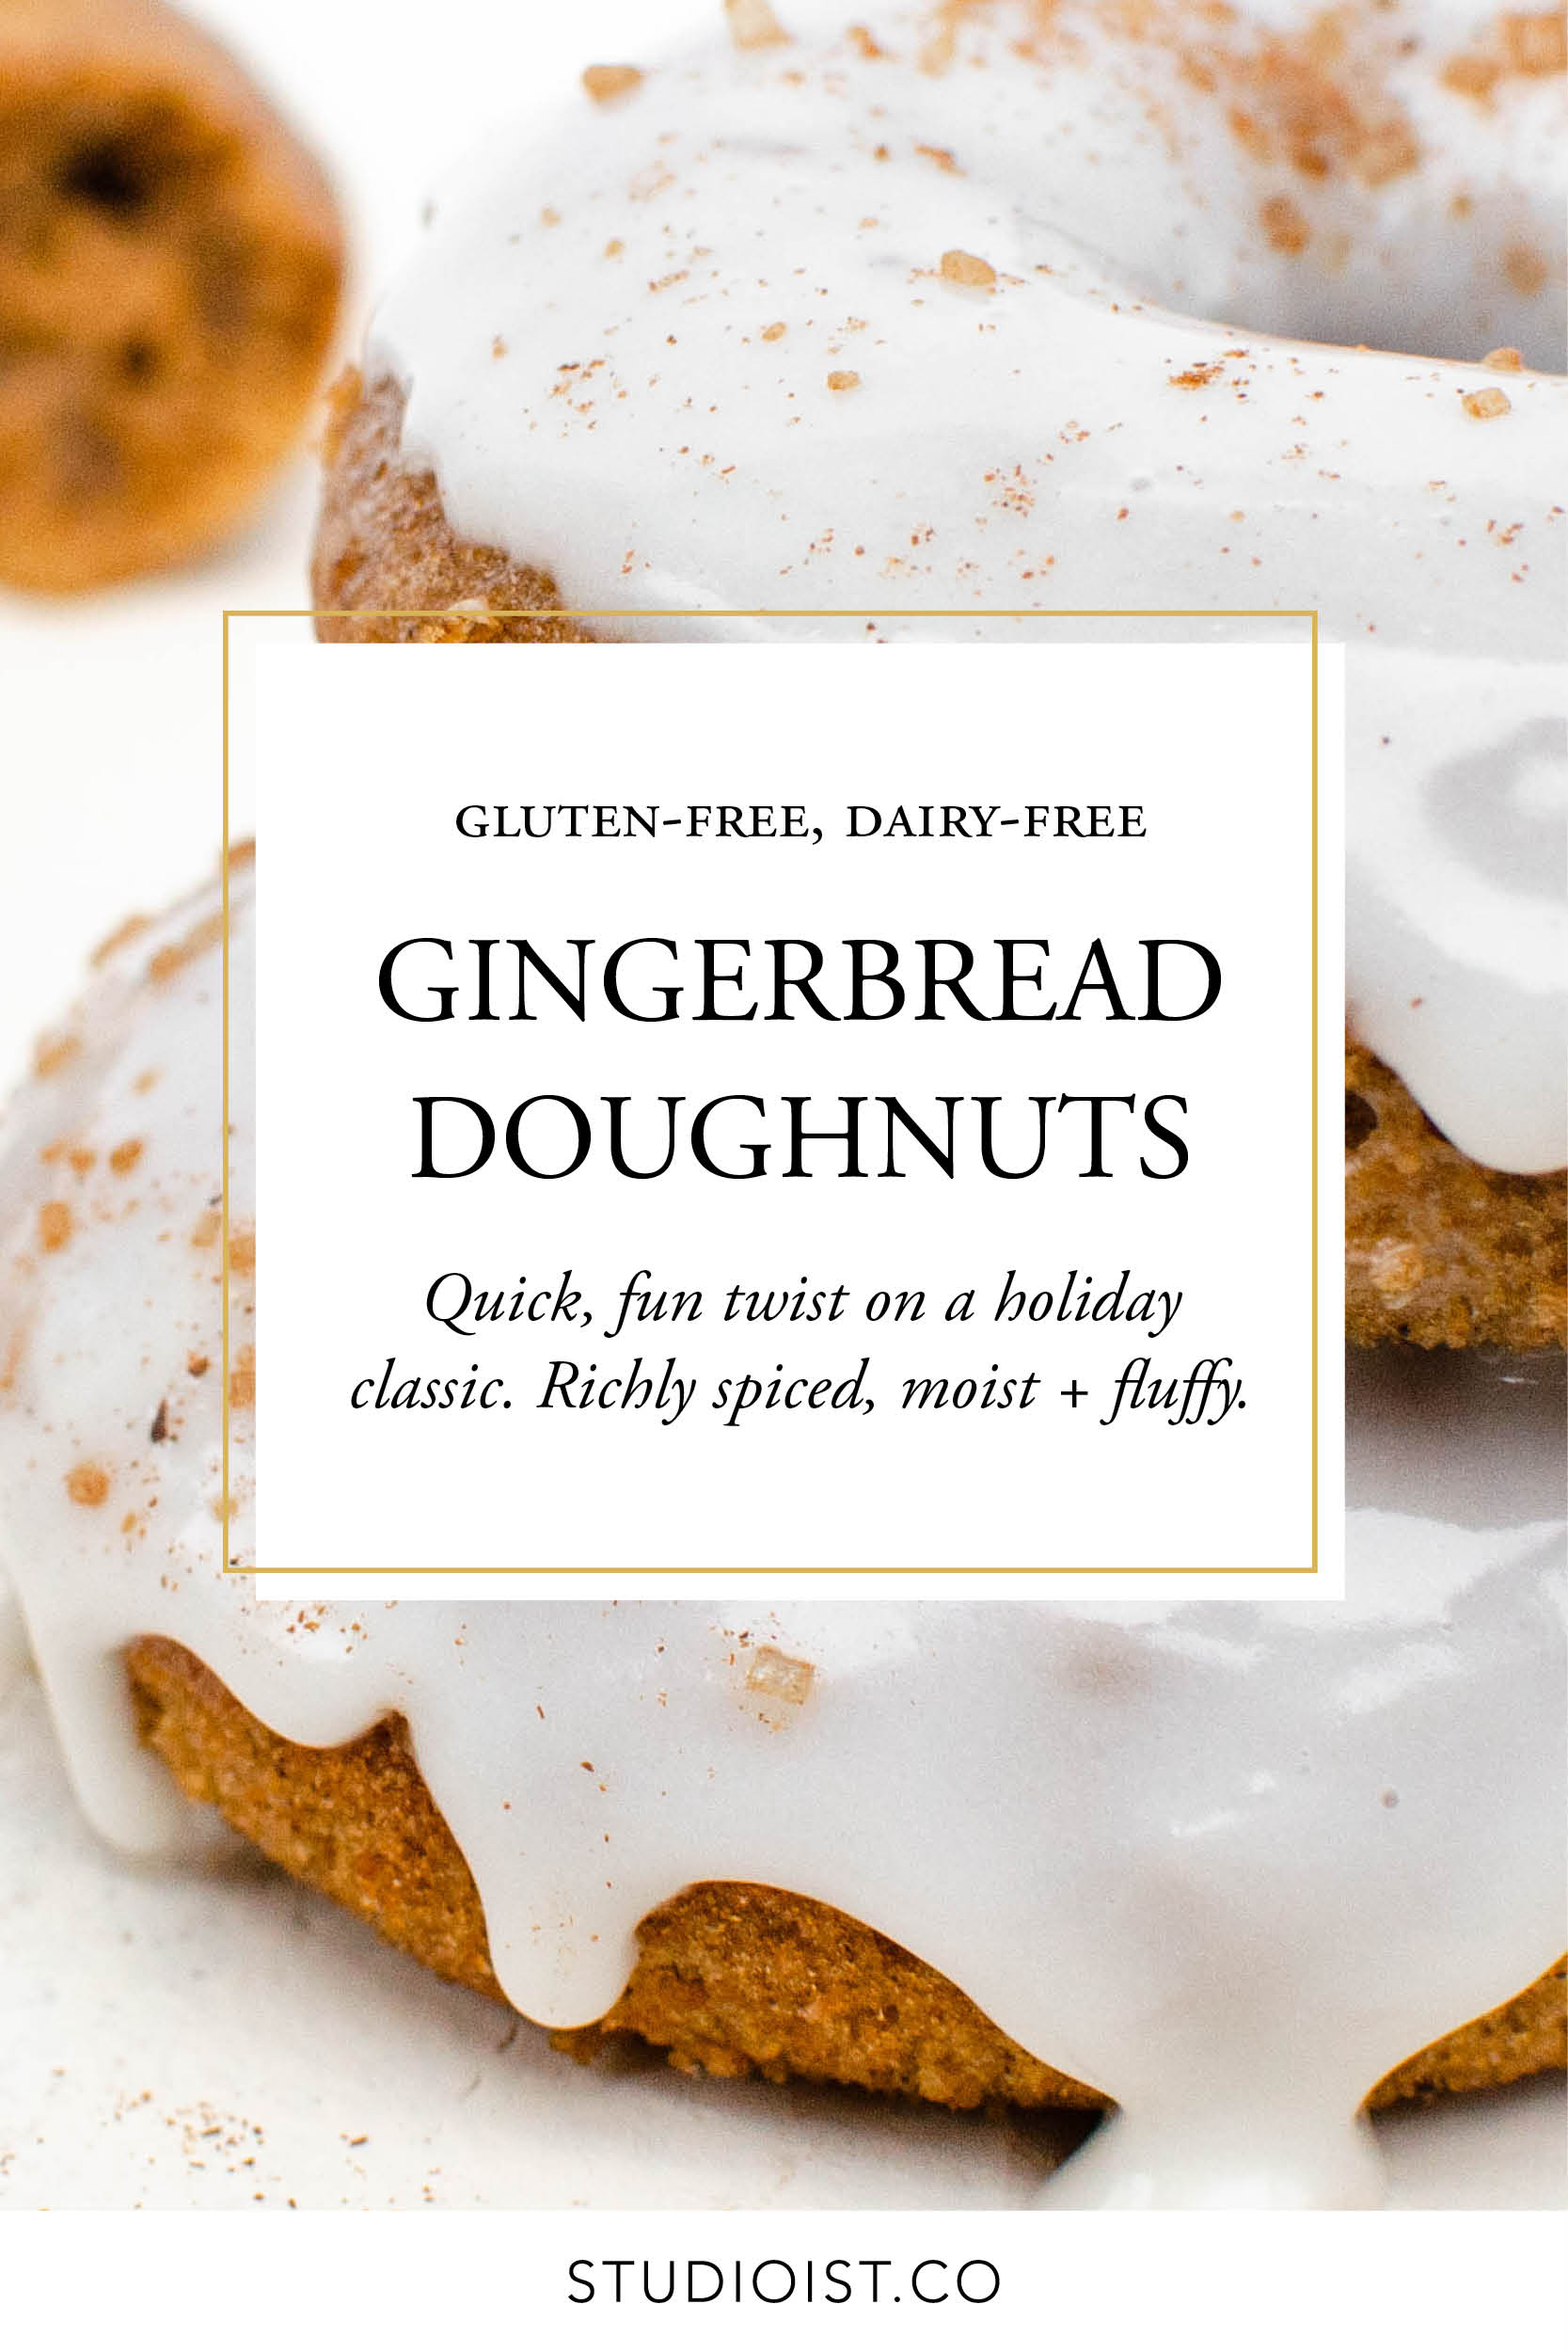 Gluten Dairy Free Gingerbread Doughnuts_Studioist.jpg